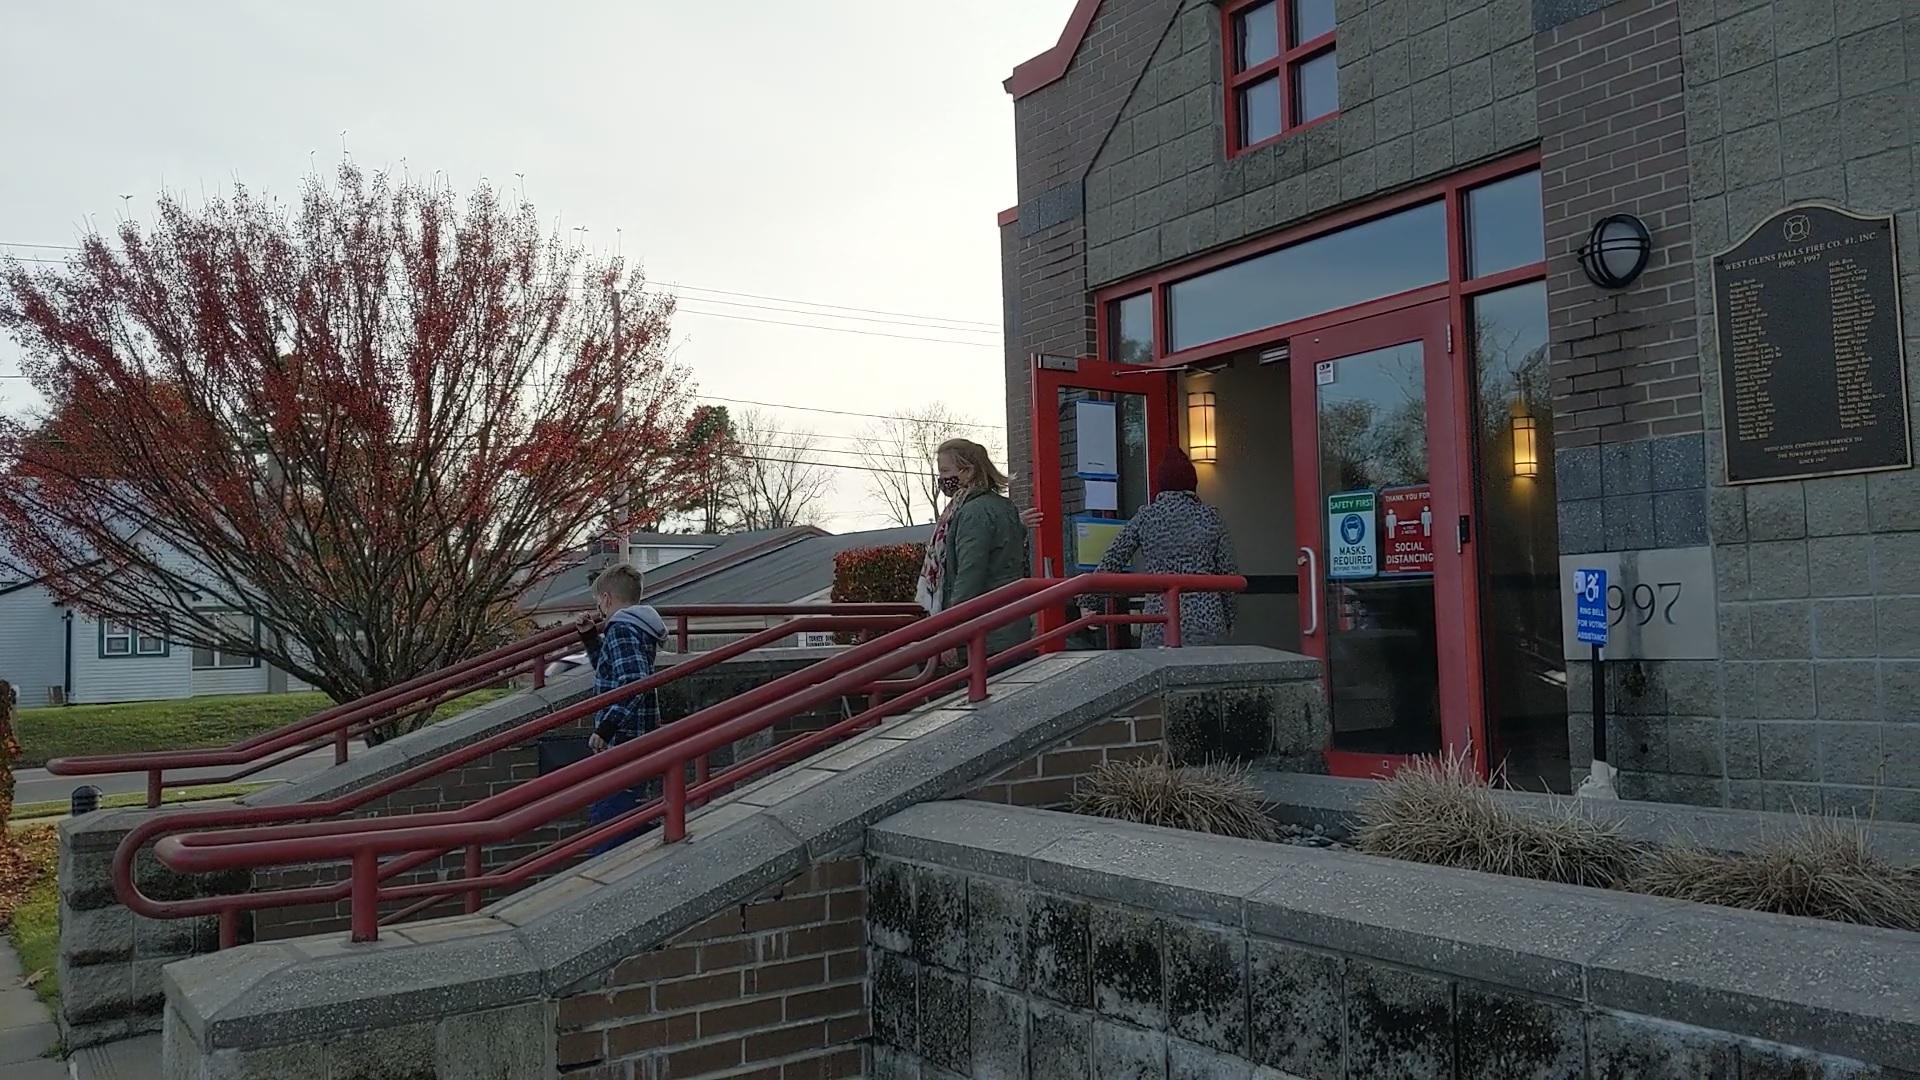 glens falls fire house voting